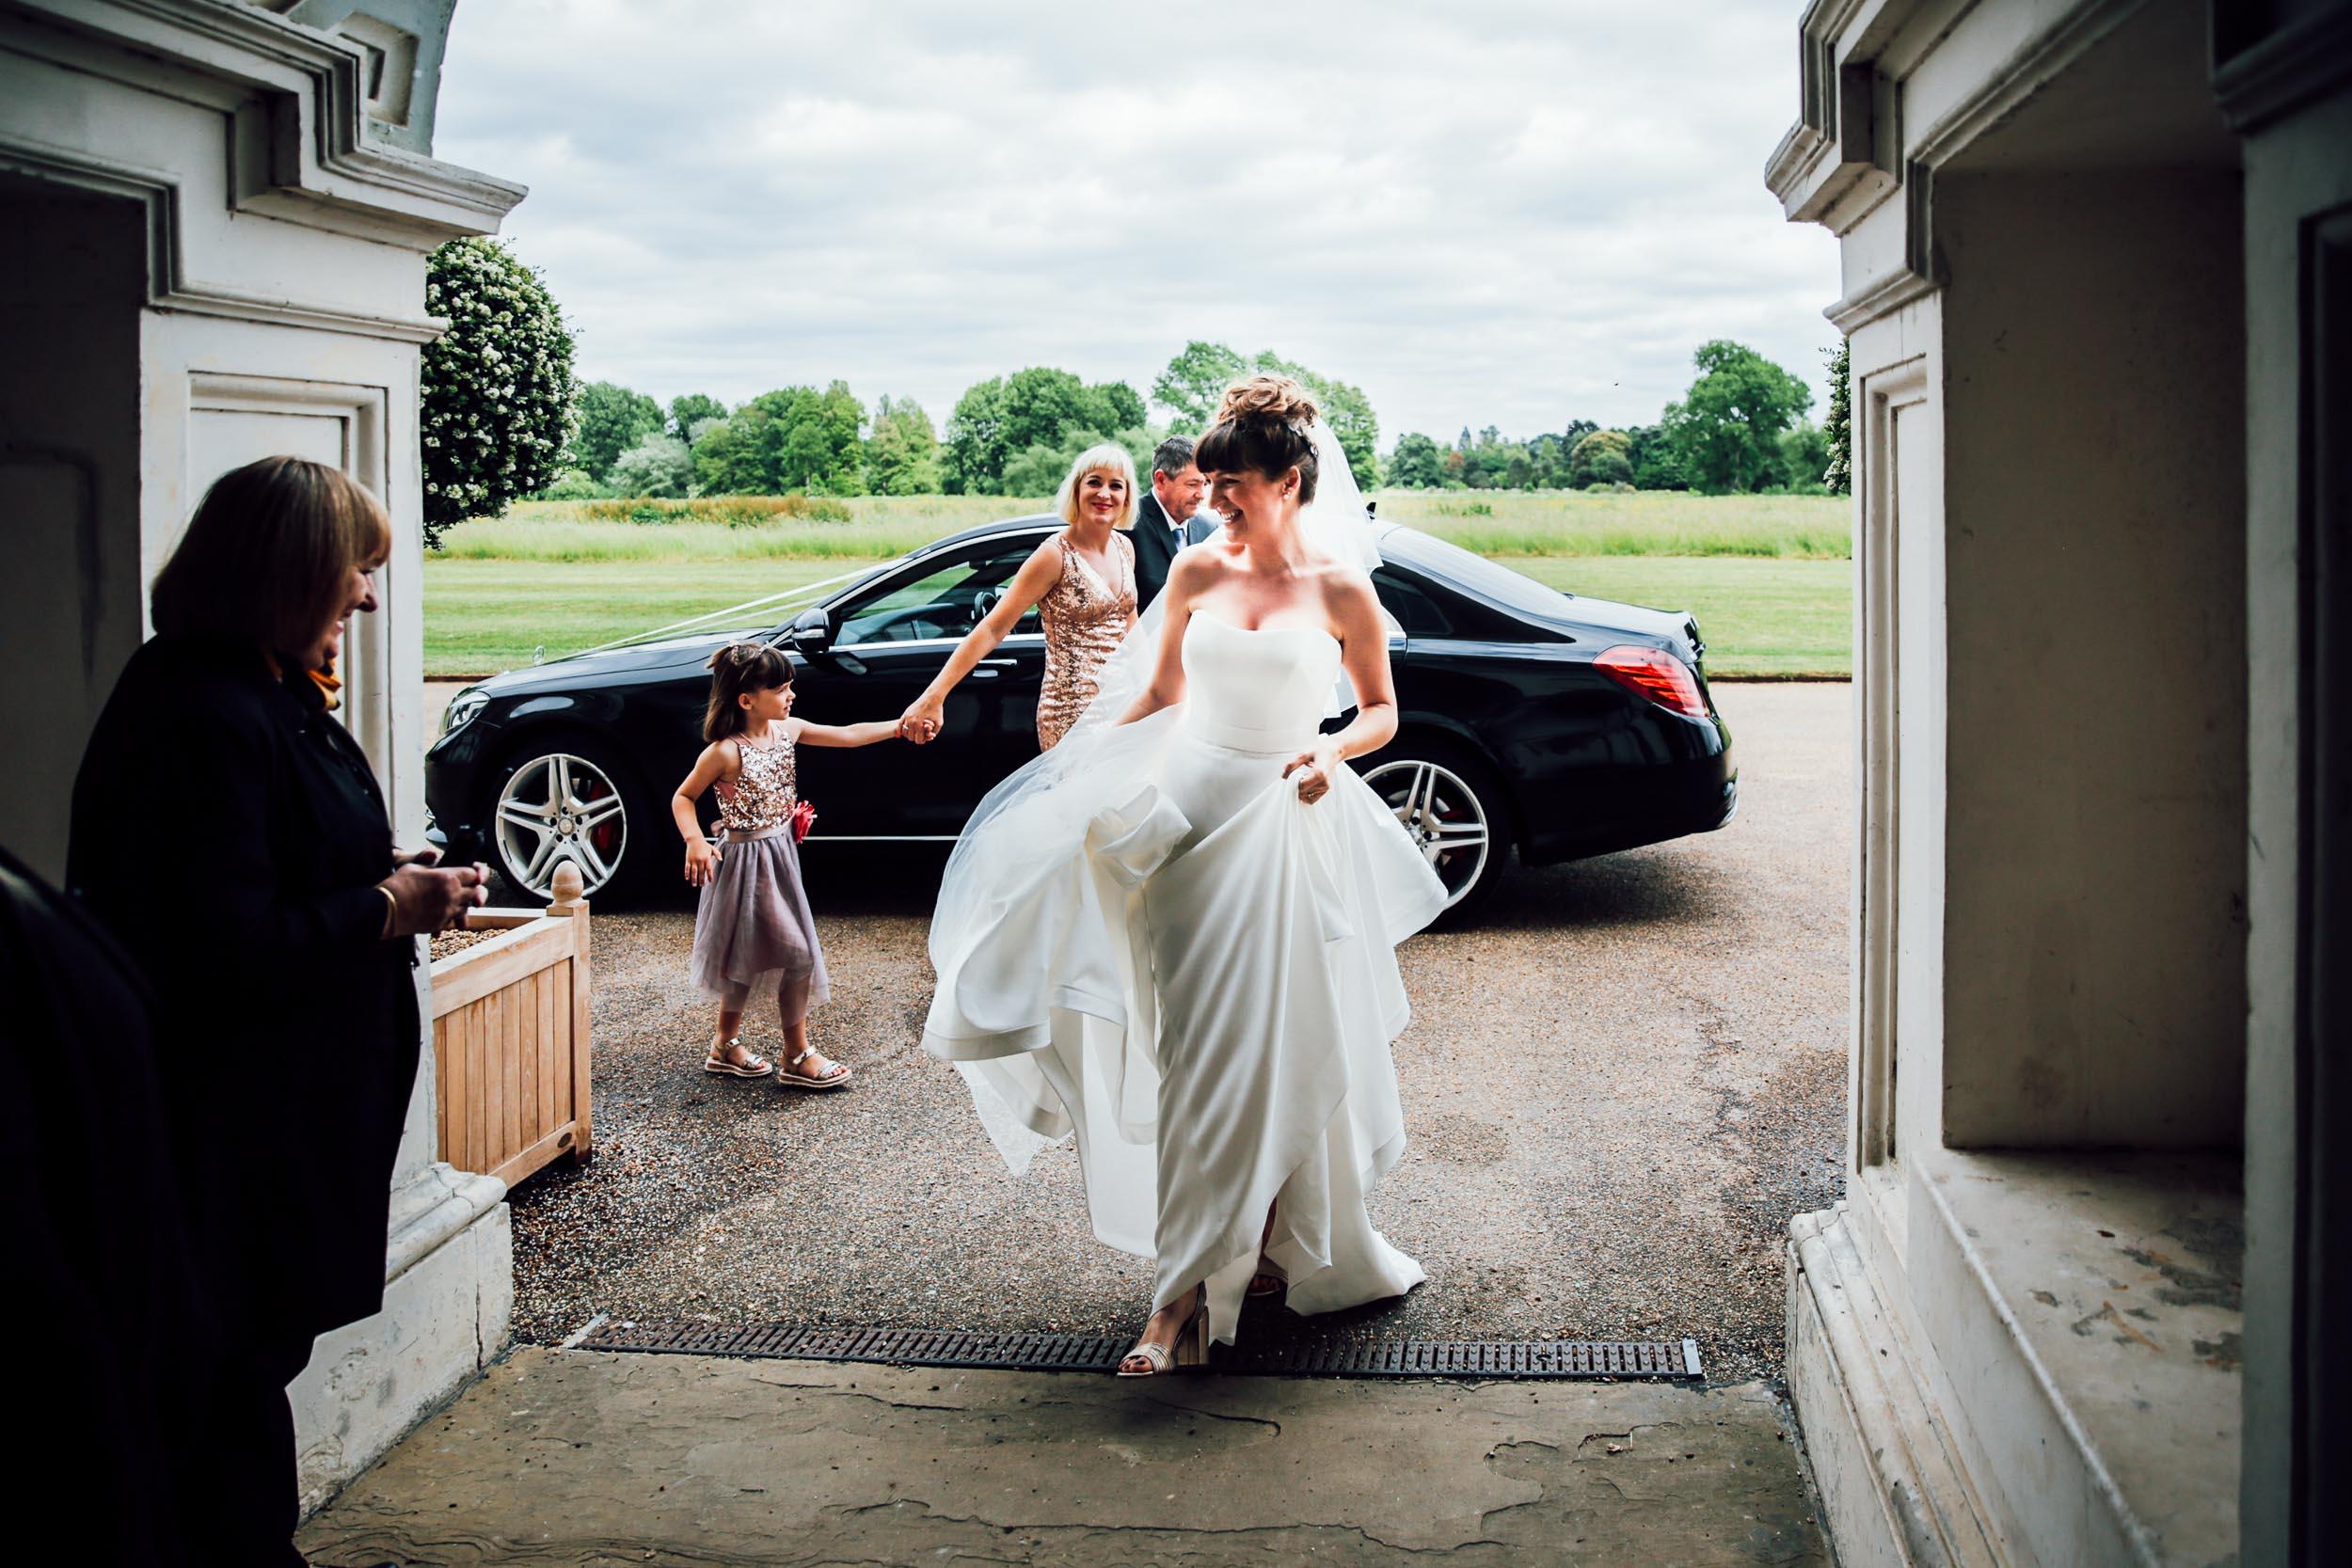 syon-house-wedding-photographer-london 039.jpg